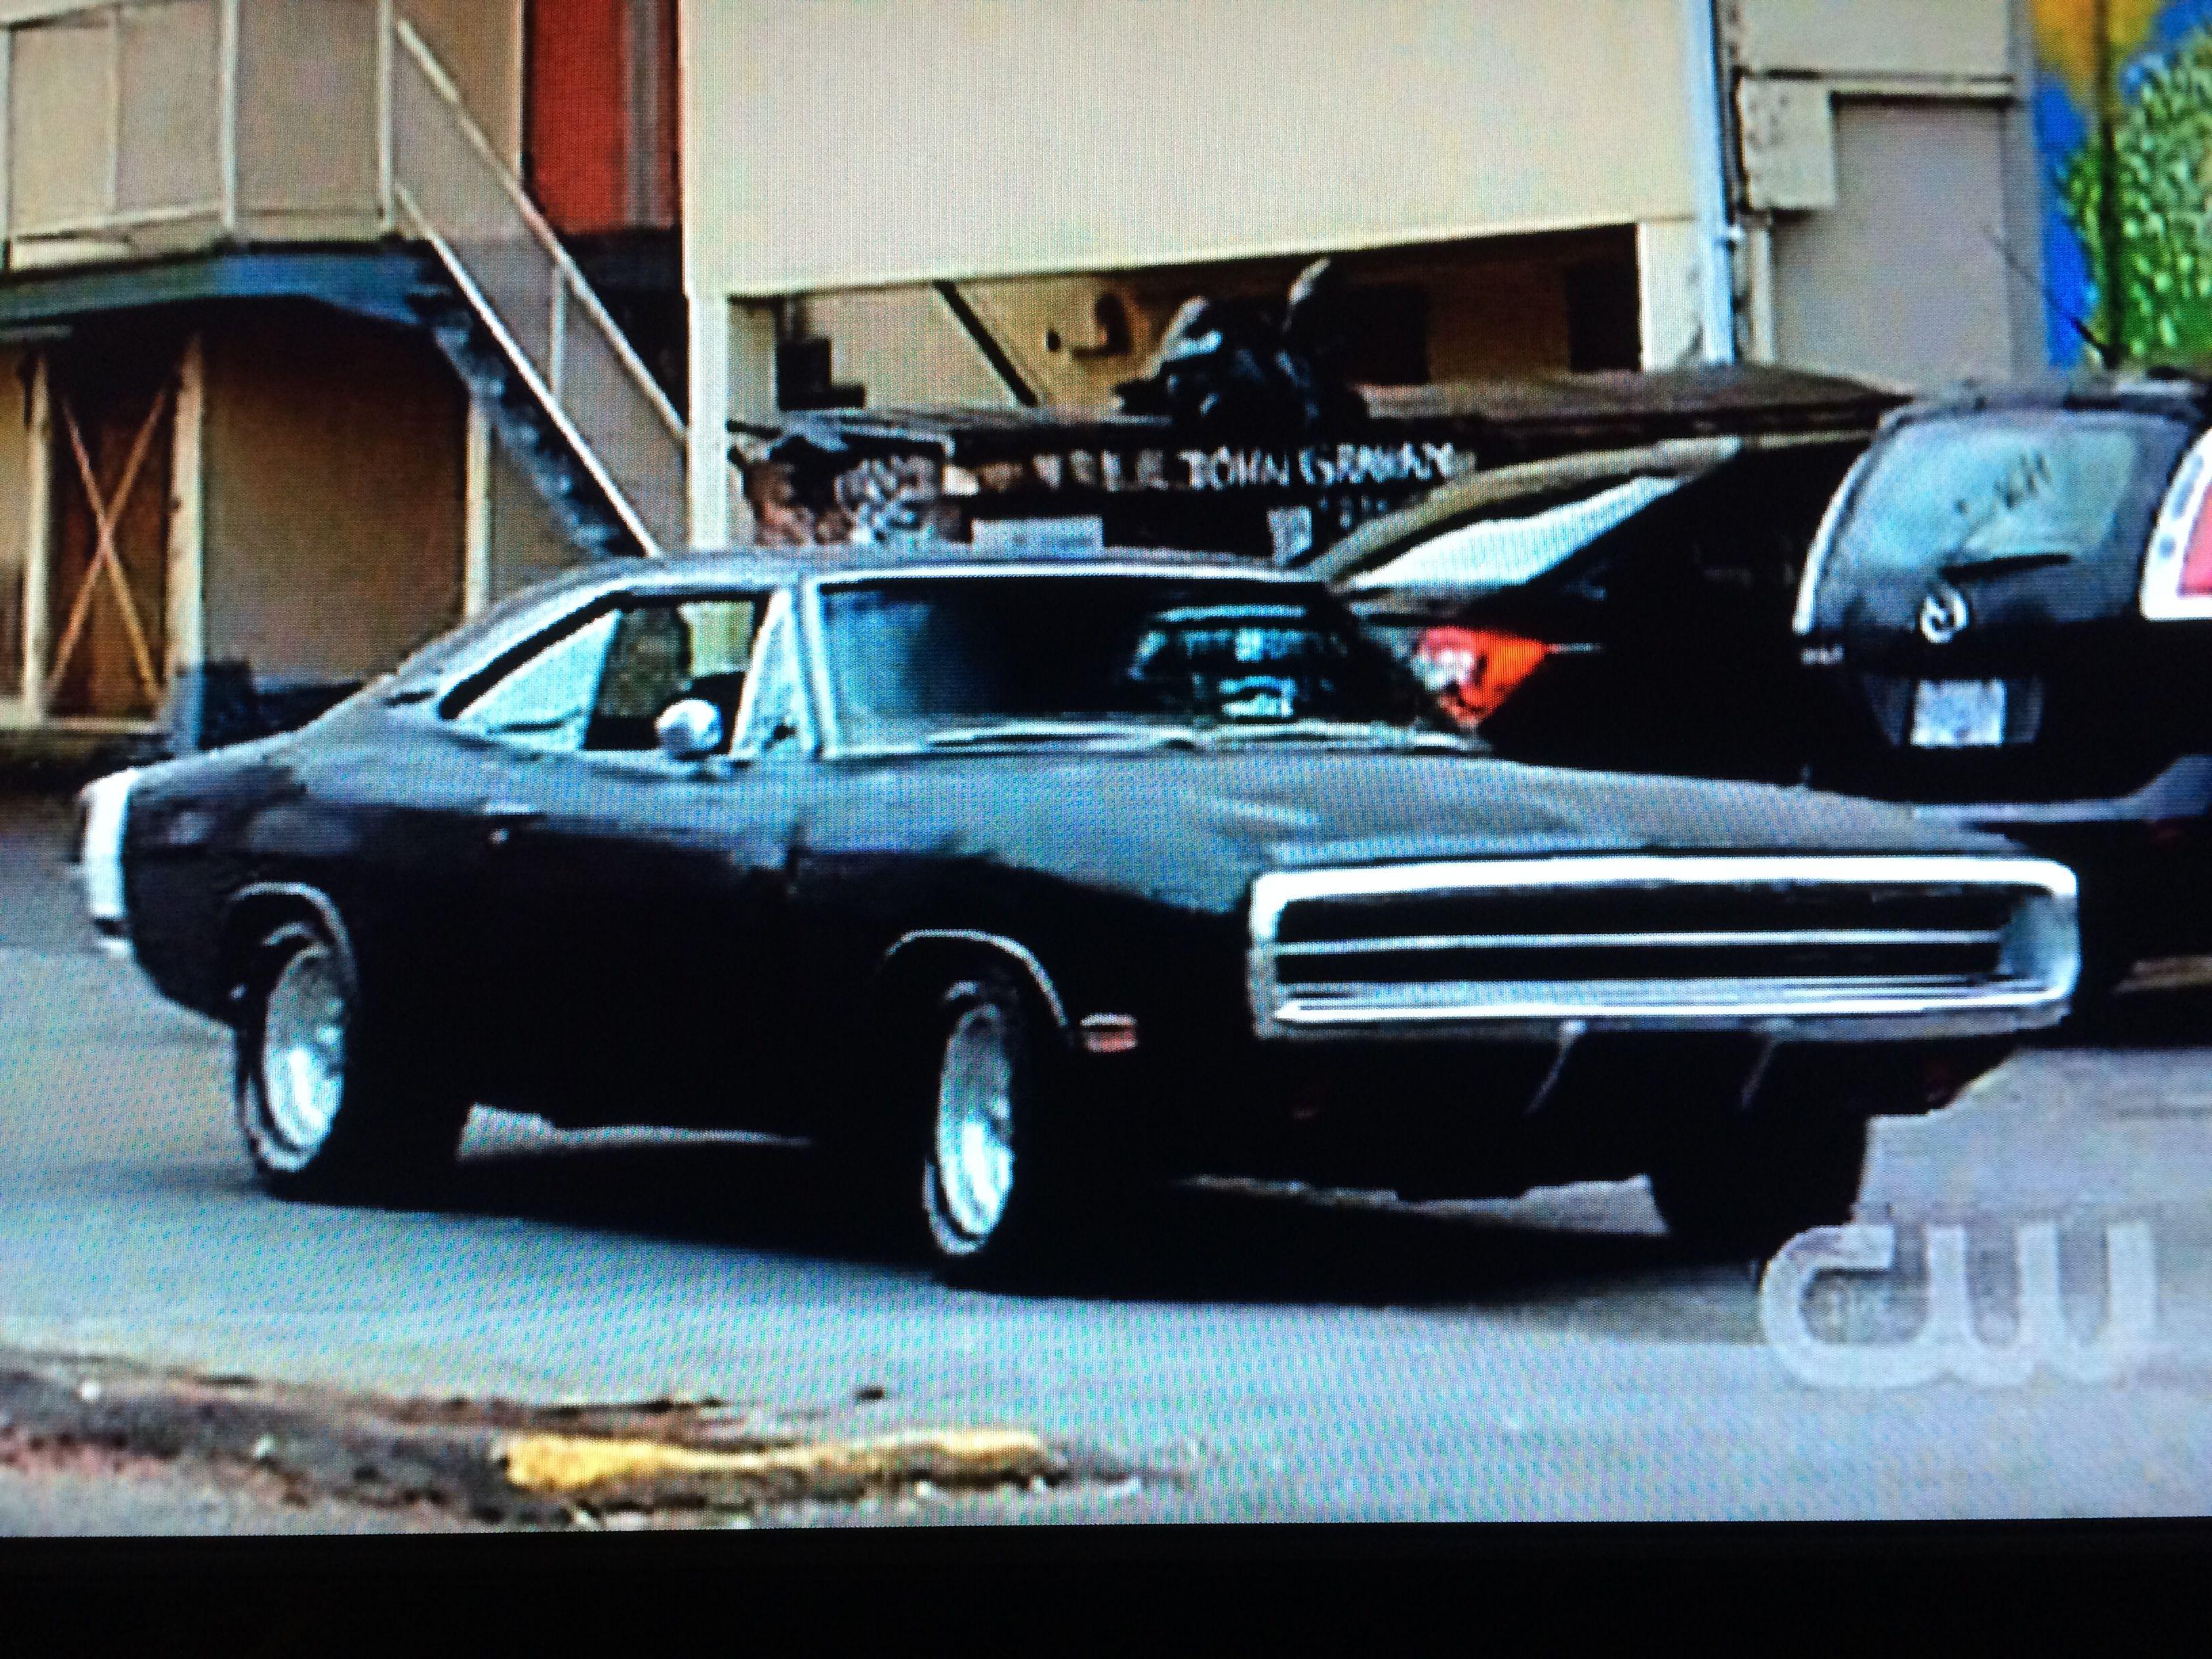 Dodge Charger 71 Garage Mechanic Work Shirt American Classic V8 Muscle Mopar Car